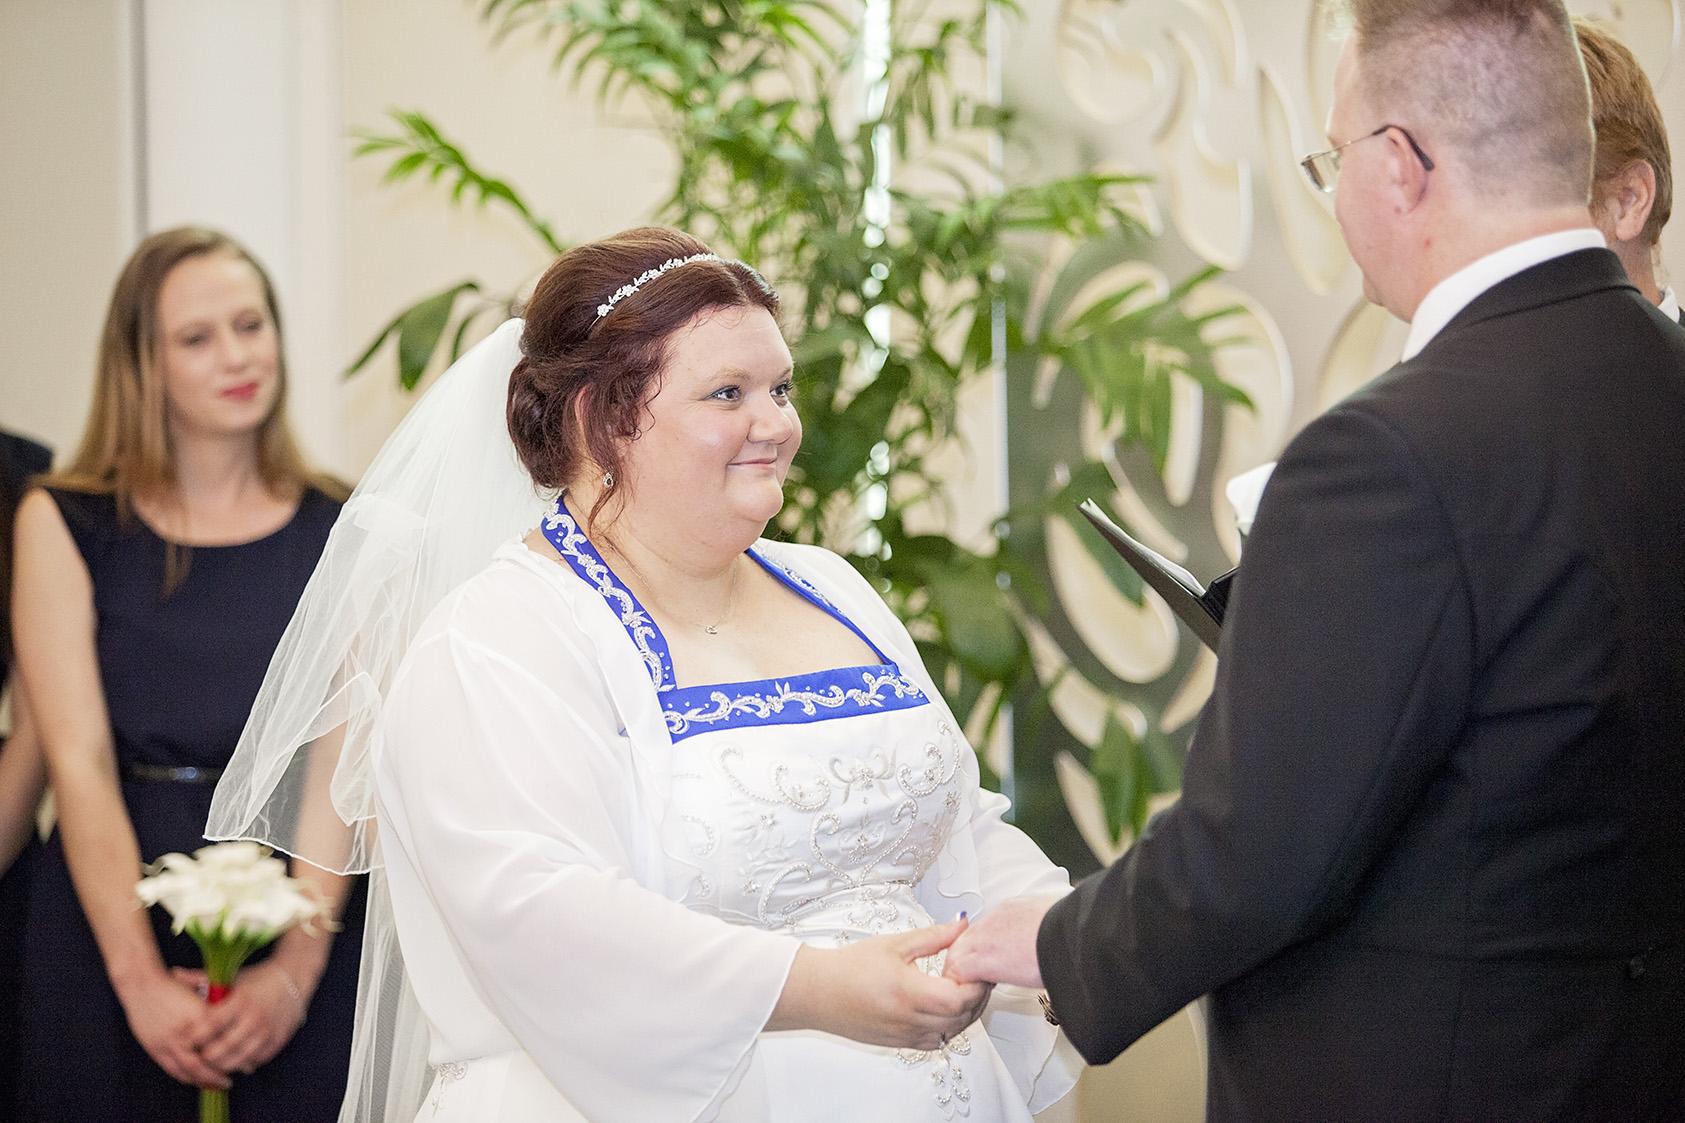 Sferas Modbury wedding 10.jpg